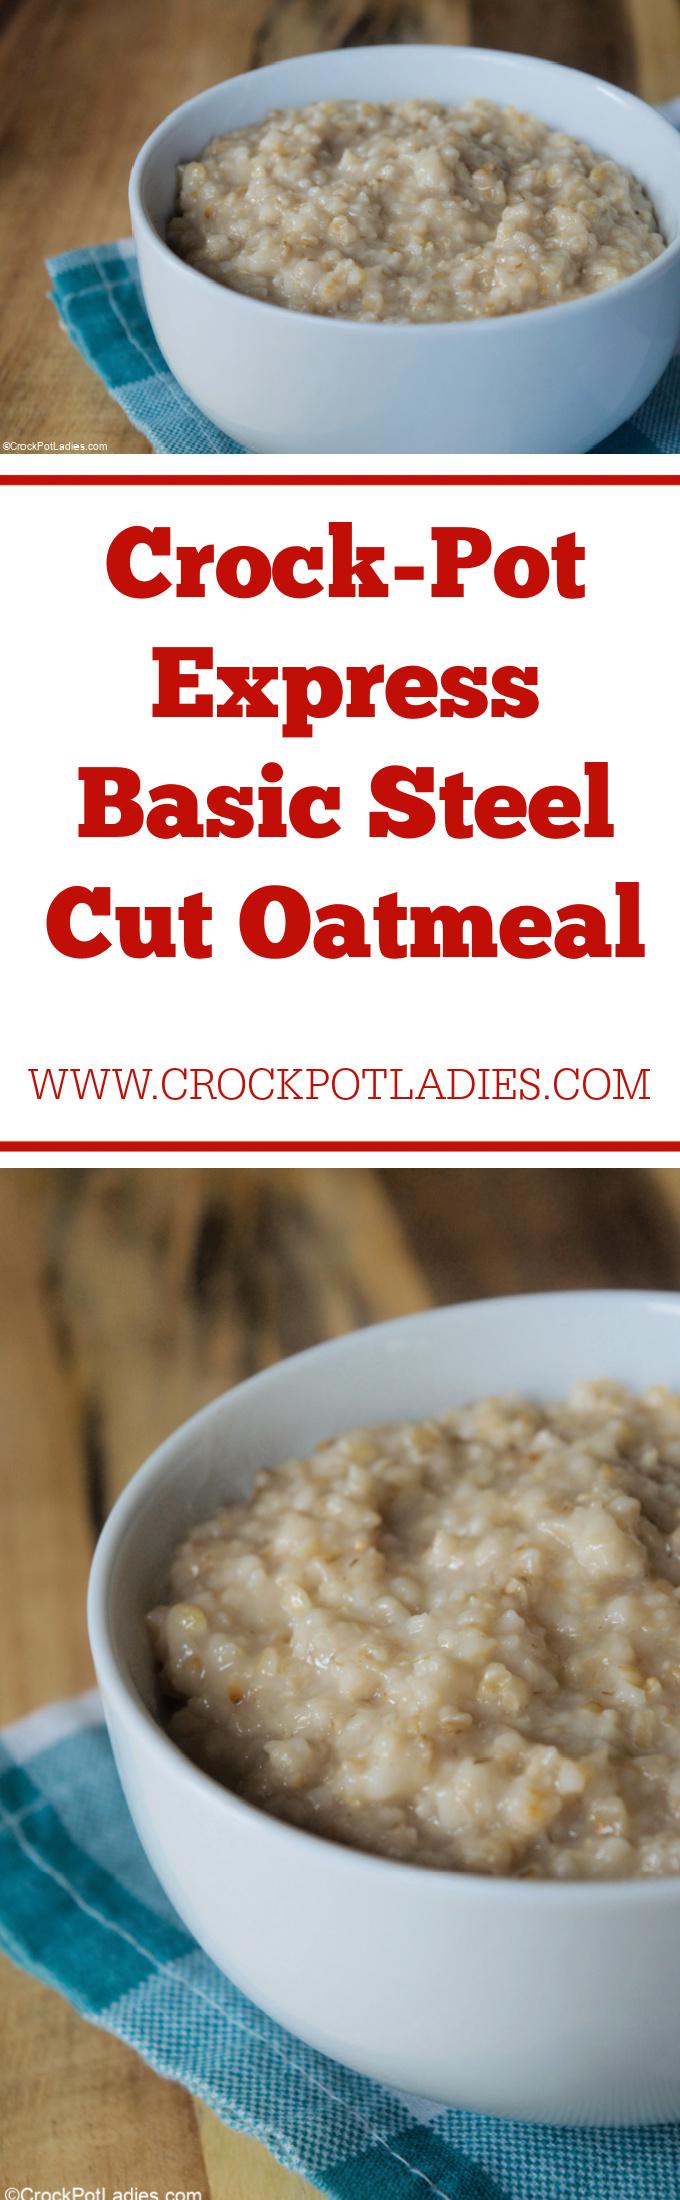 Crock-Pot Express Basic Steel Cut Oatmeal